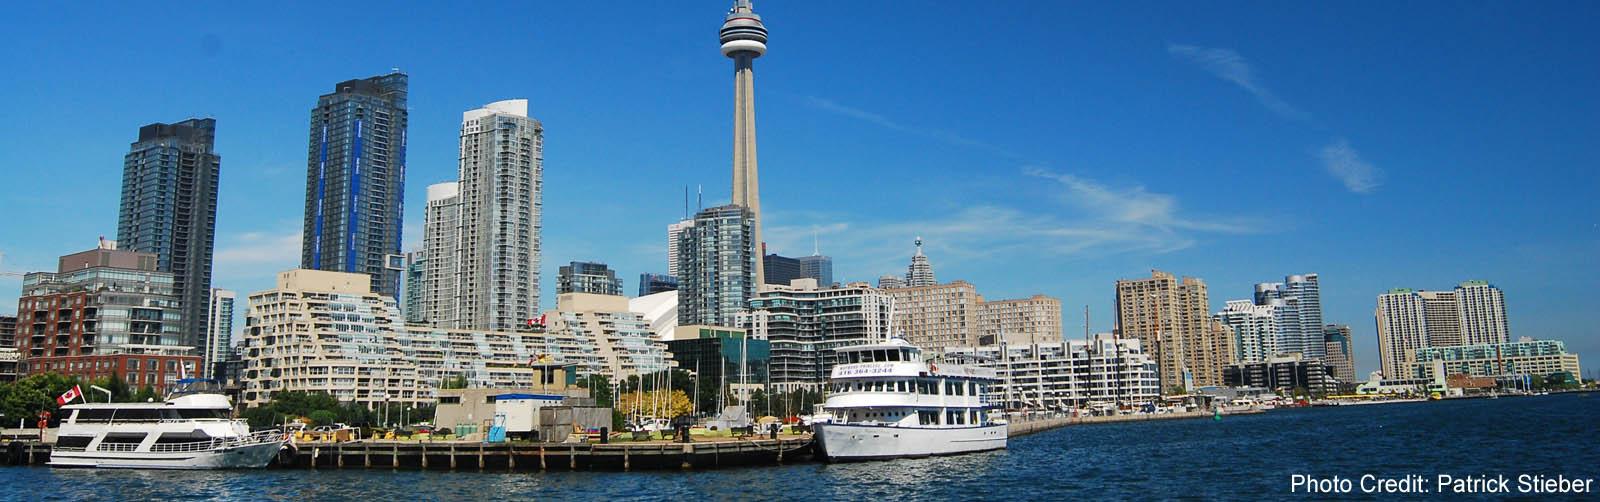 Toronto - Island Airport view of Downtown Skyline -sliver (Patrick Stieber)